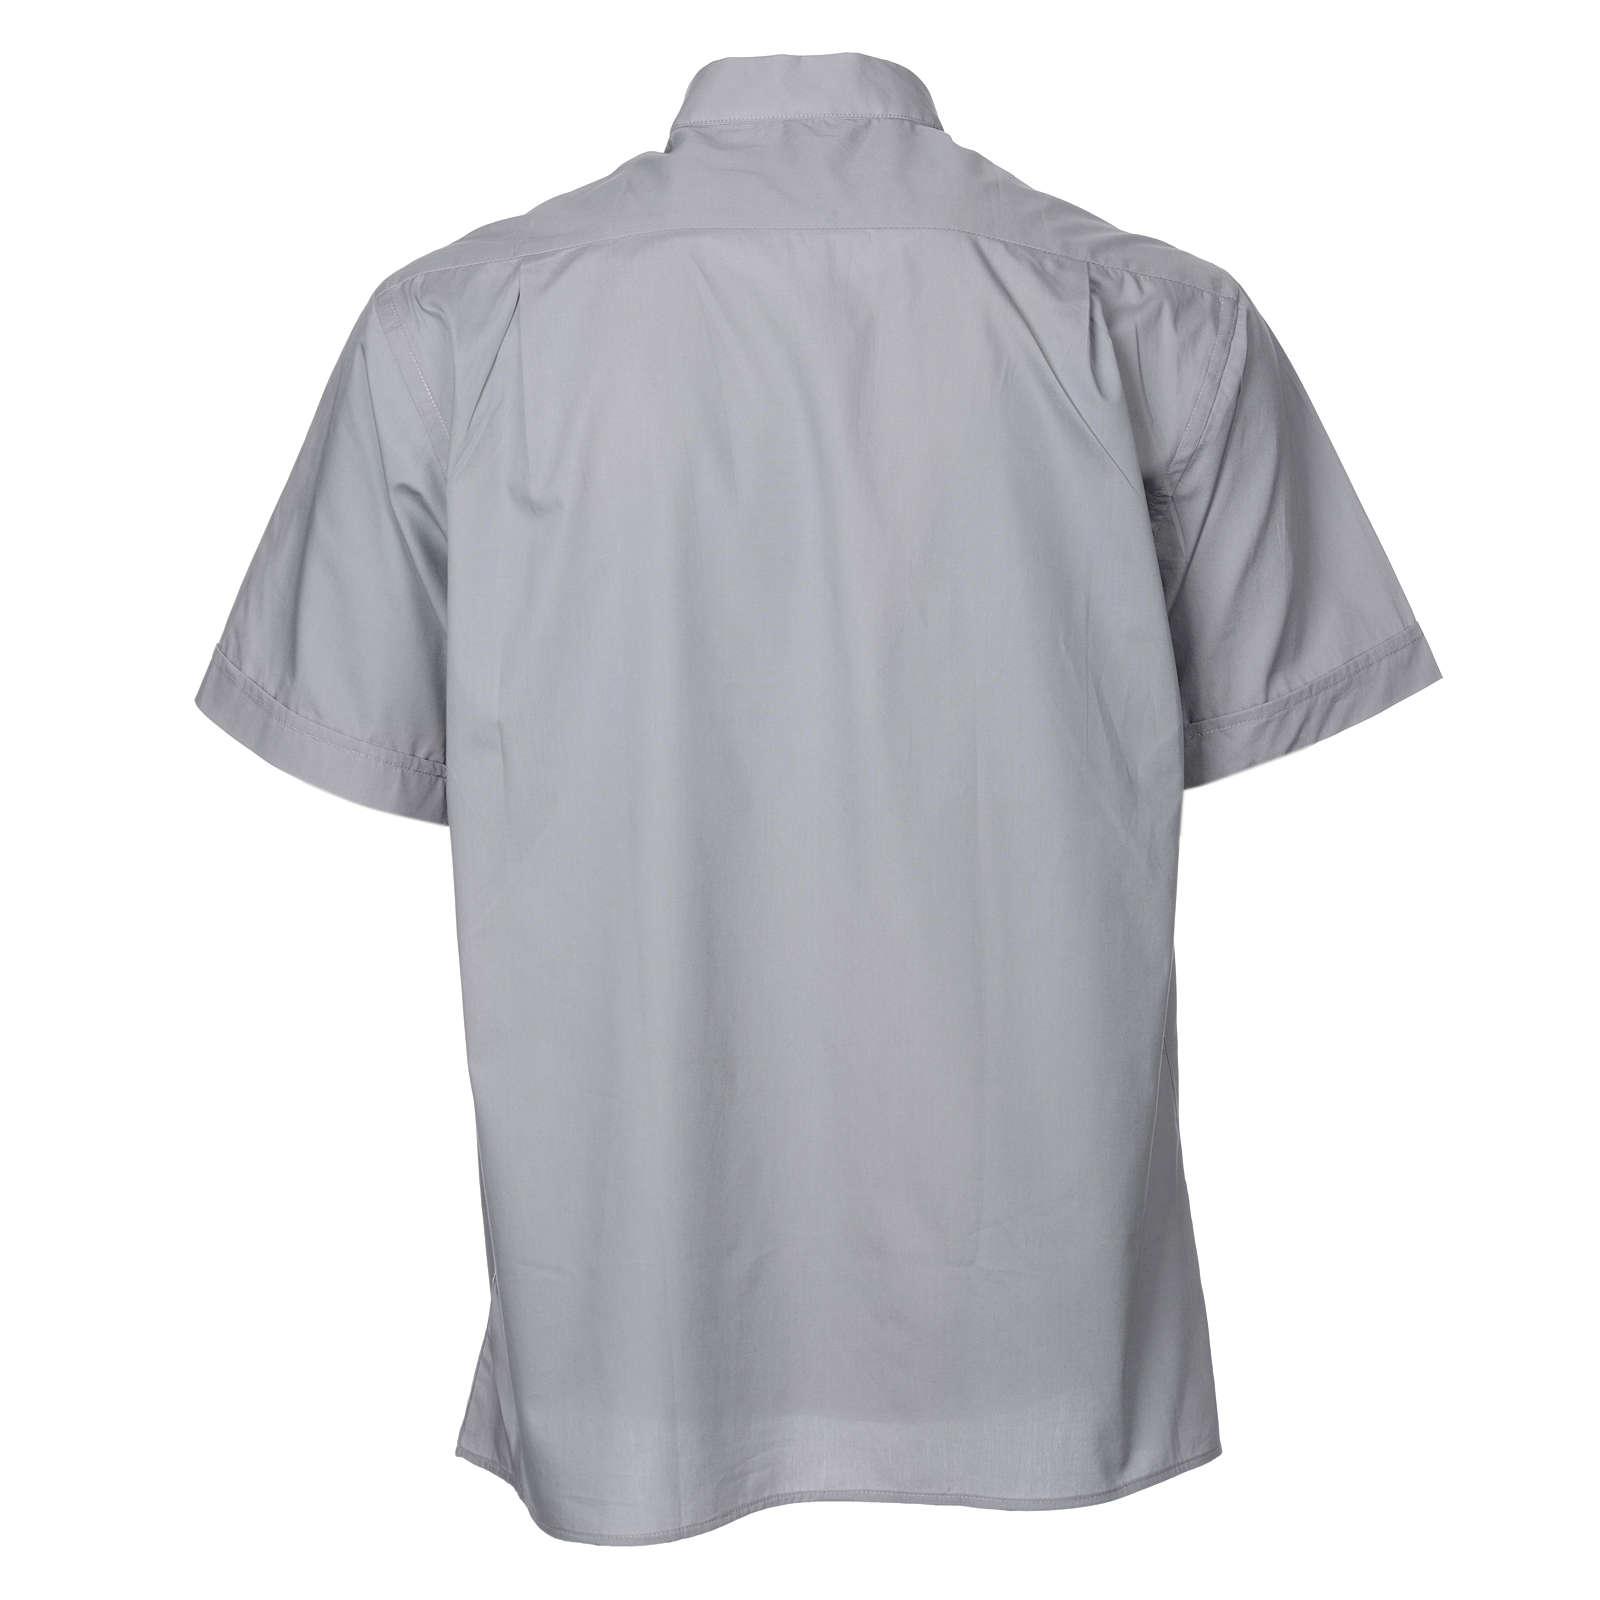 STOCK Camisa clergyman manga curta misto cinzento claro 4